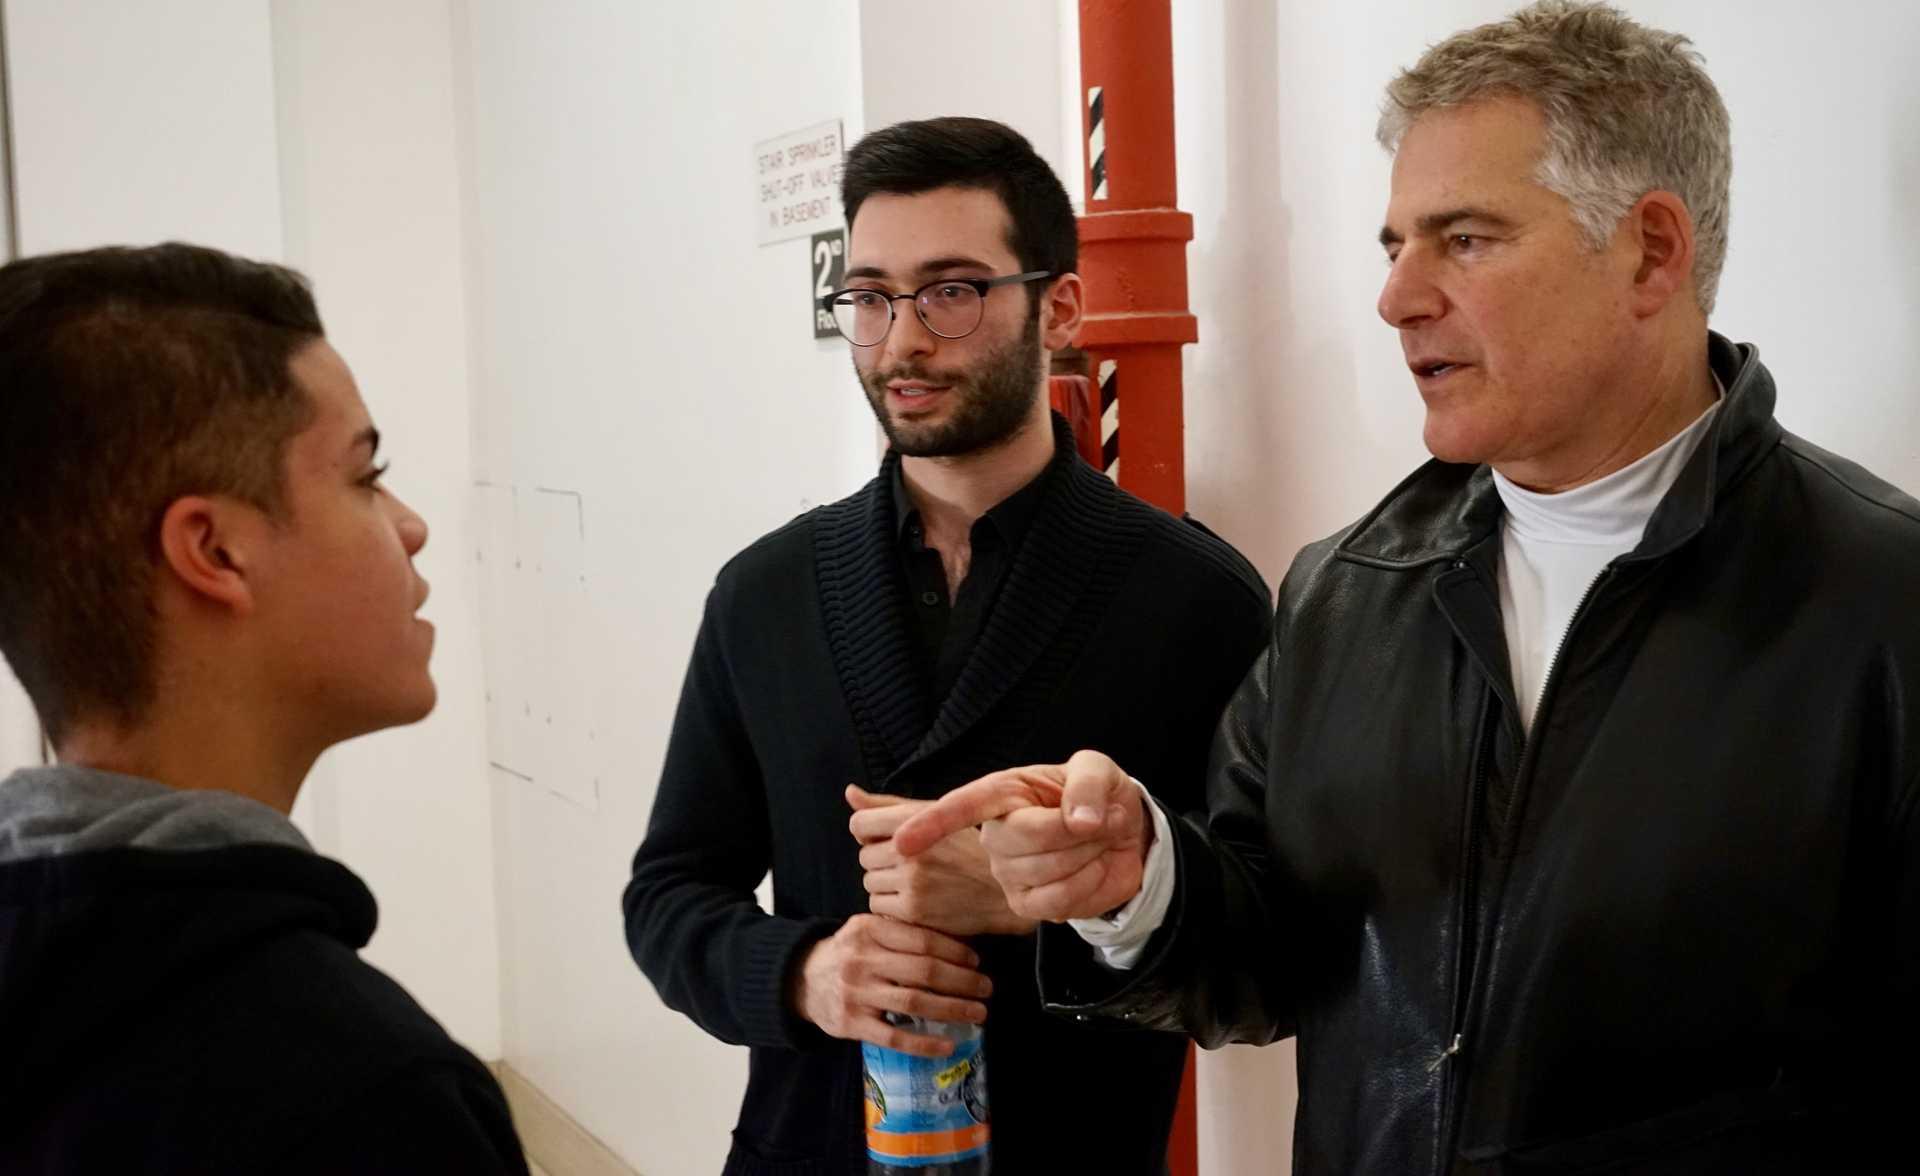 Stephen Adubato's father Steven Adubato Jr. speaks with Nathaniel Cruz at the New York Encounter, January 14.